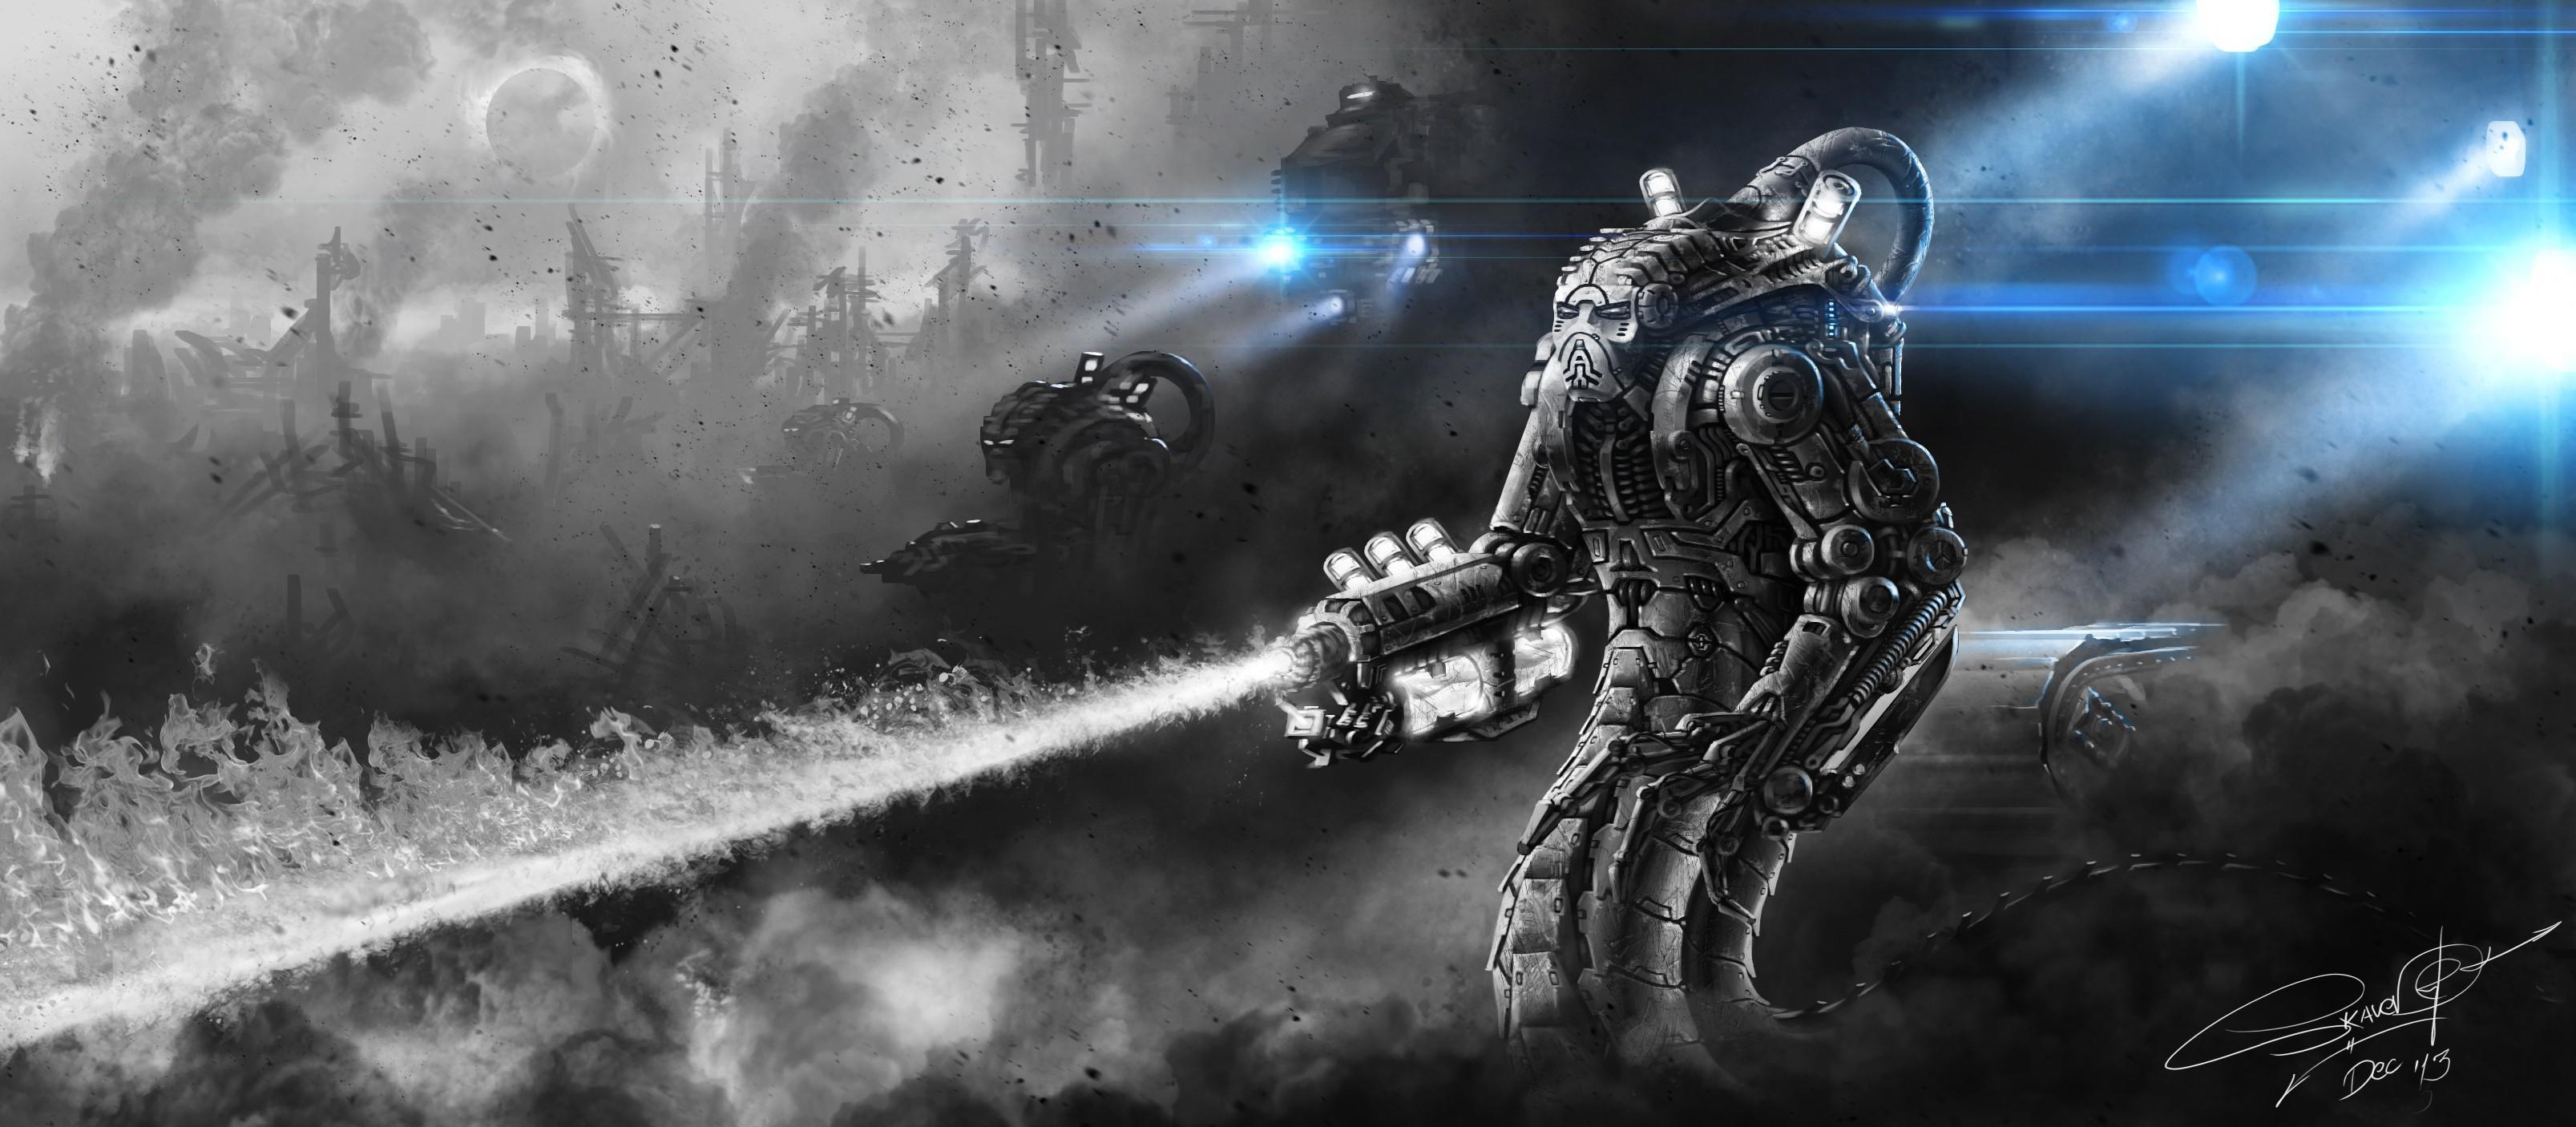 cyborg robot cool war wallpapers – photo #11